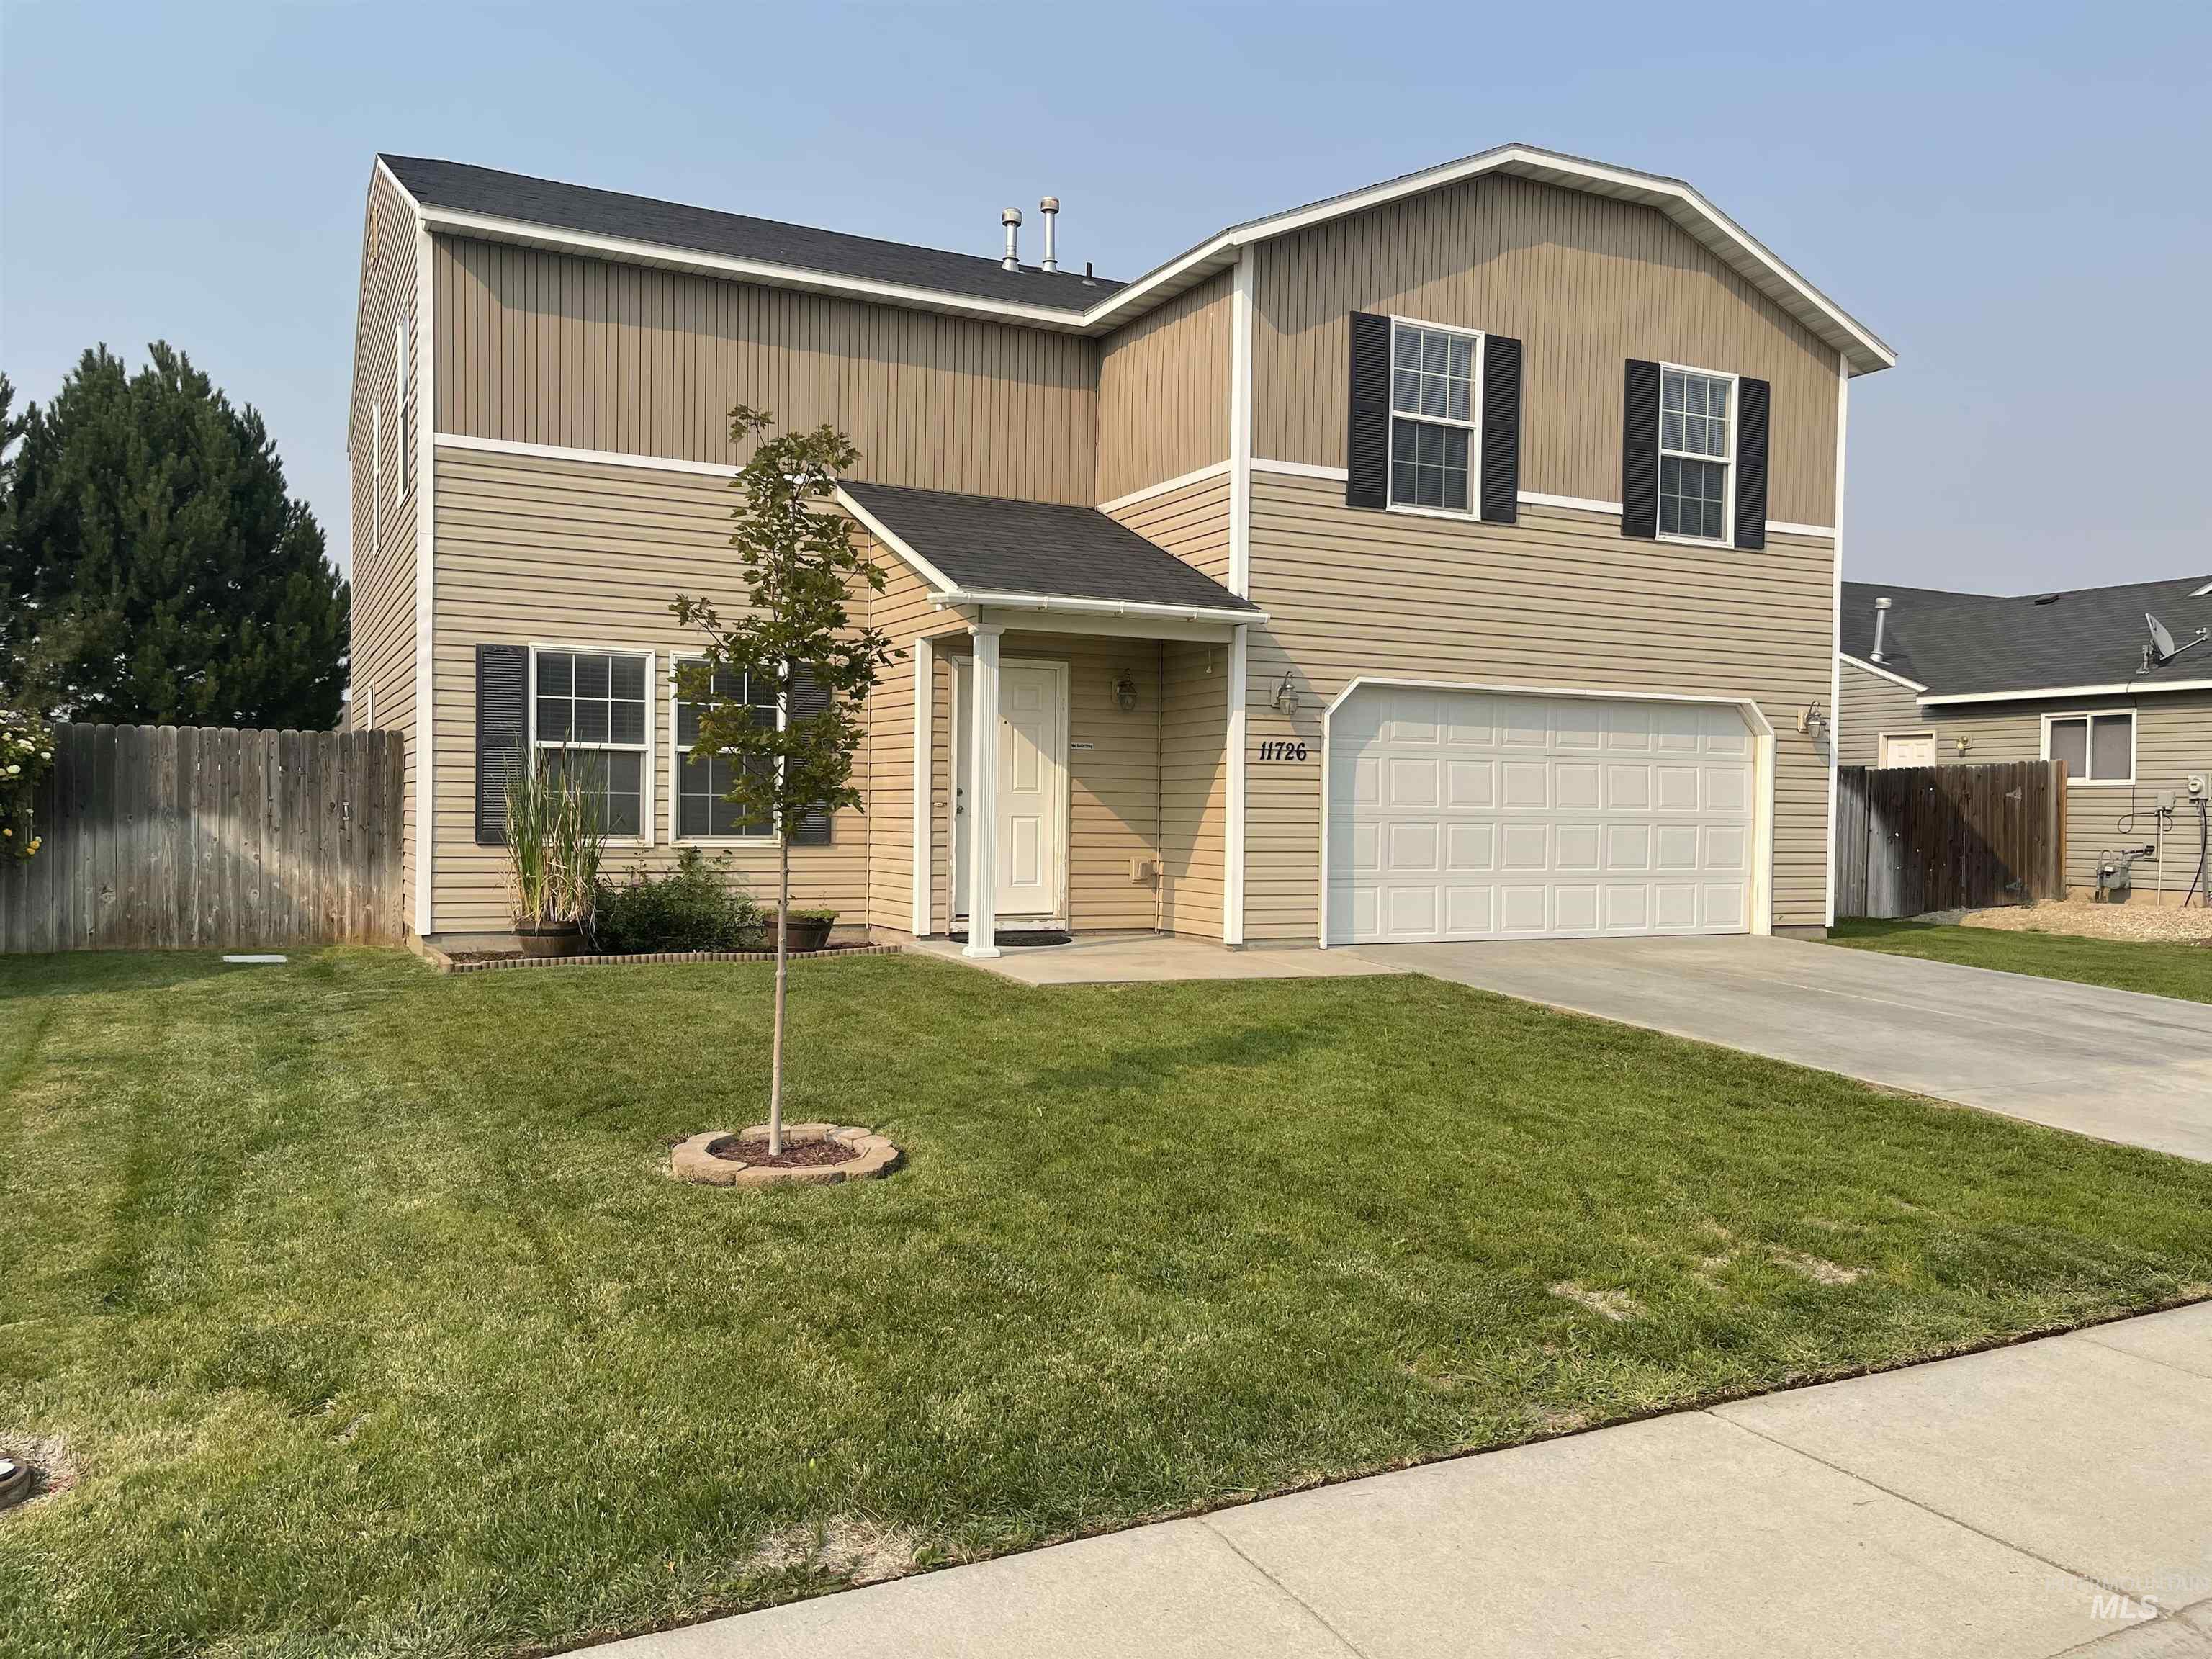 11726 Cabin Creek St Property Photo